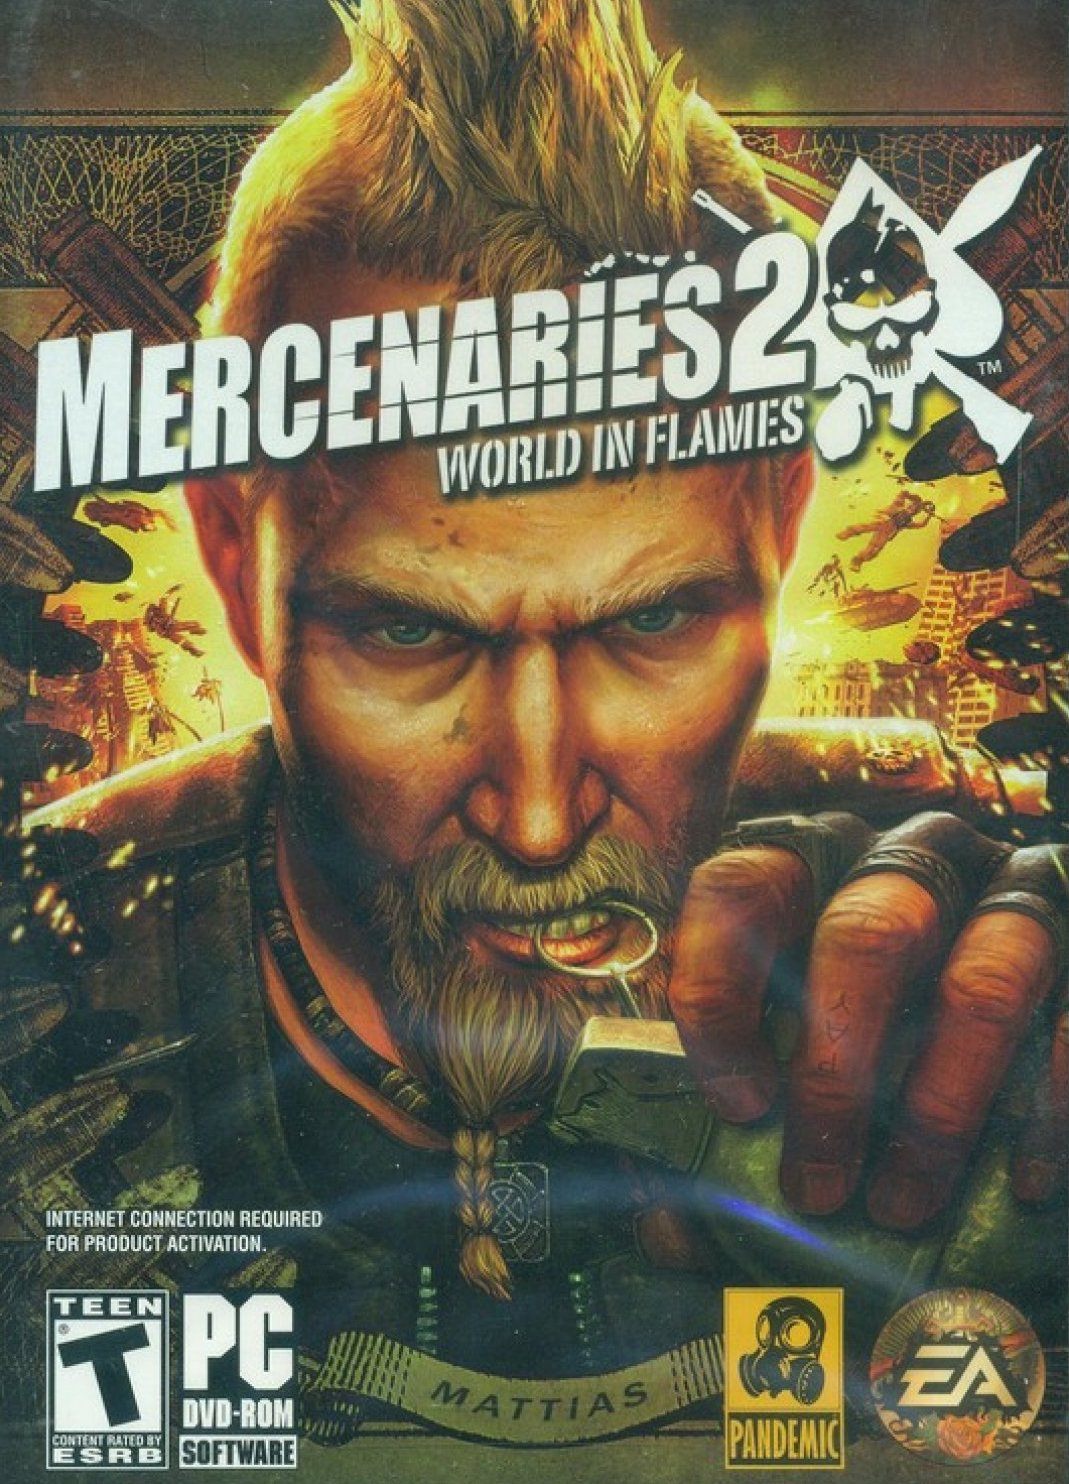 PC hra - Mercenaries 2 - World in Flames - DVD-ROM /plast//bazarové zboží/